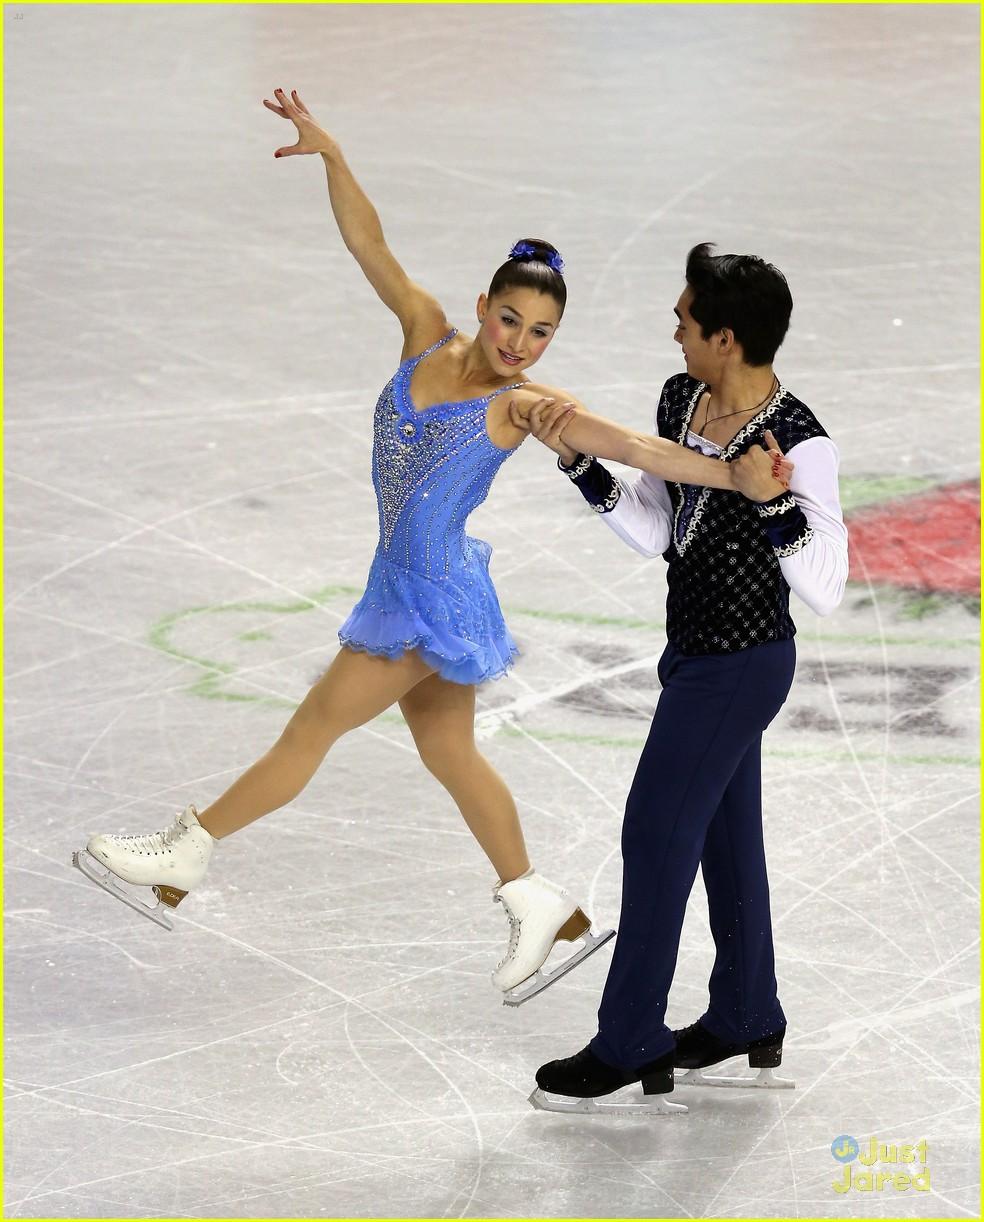 us pairs heat up skate america 2014 short program 07